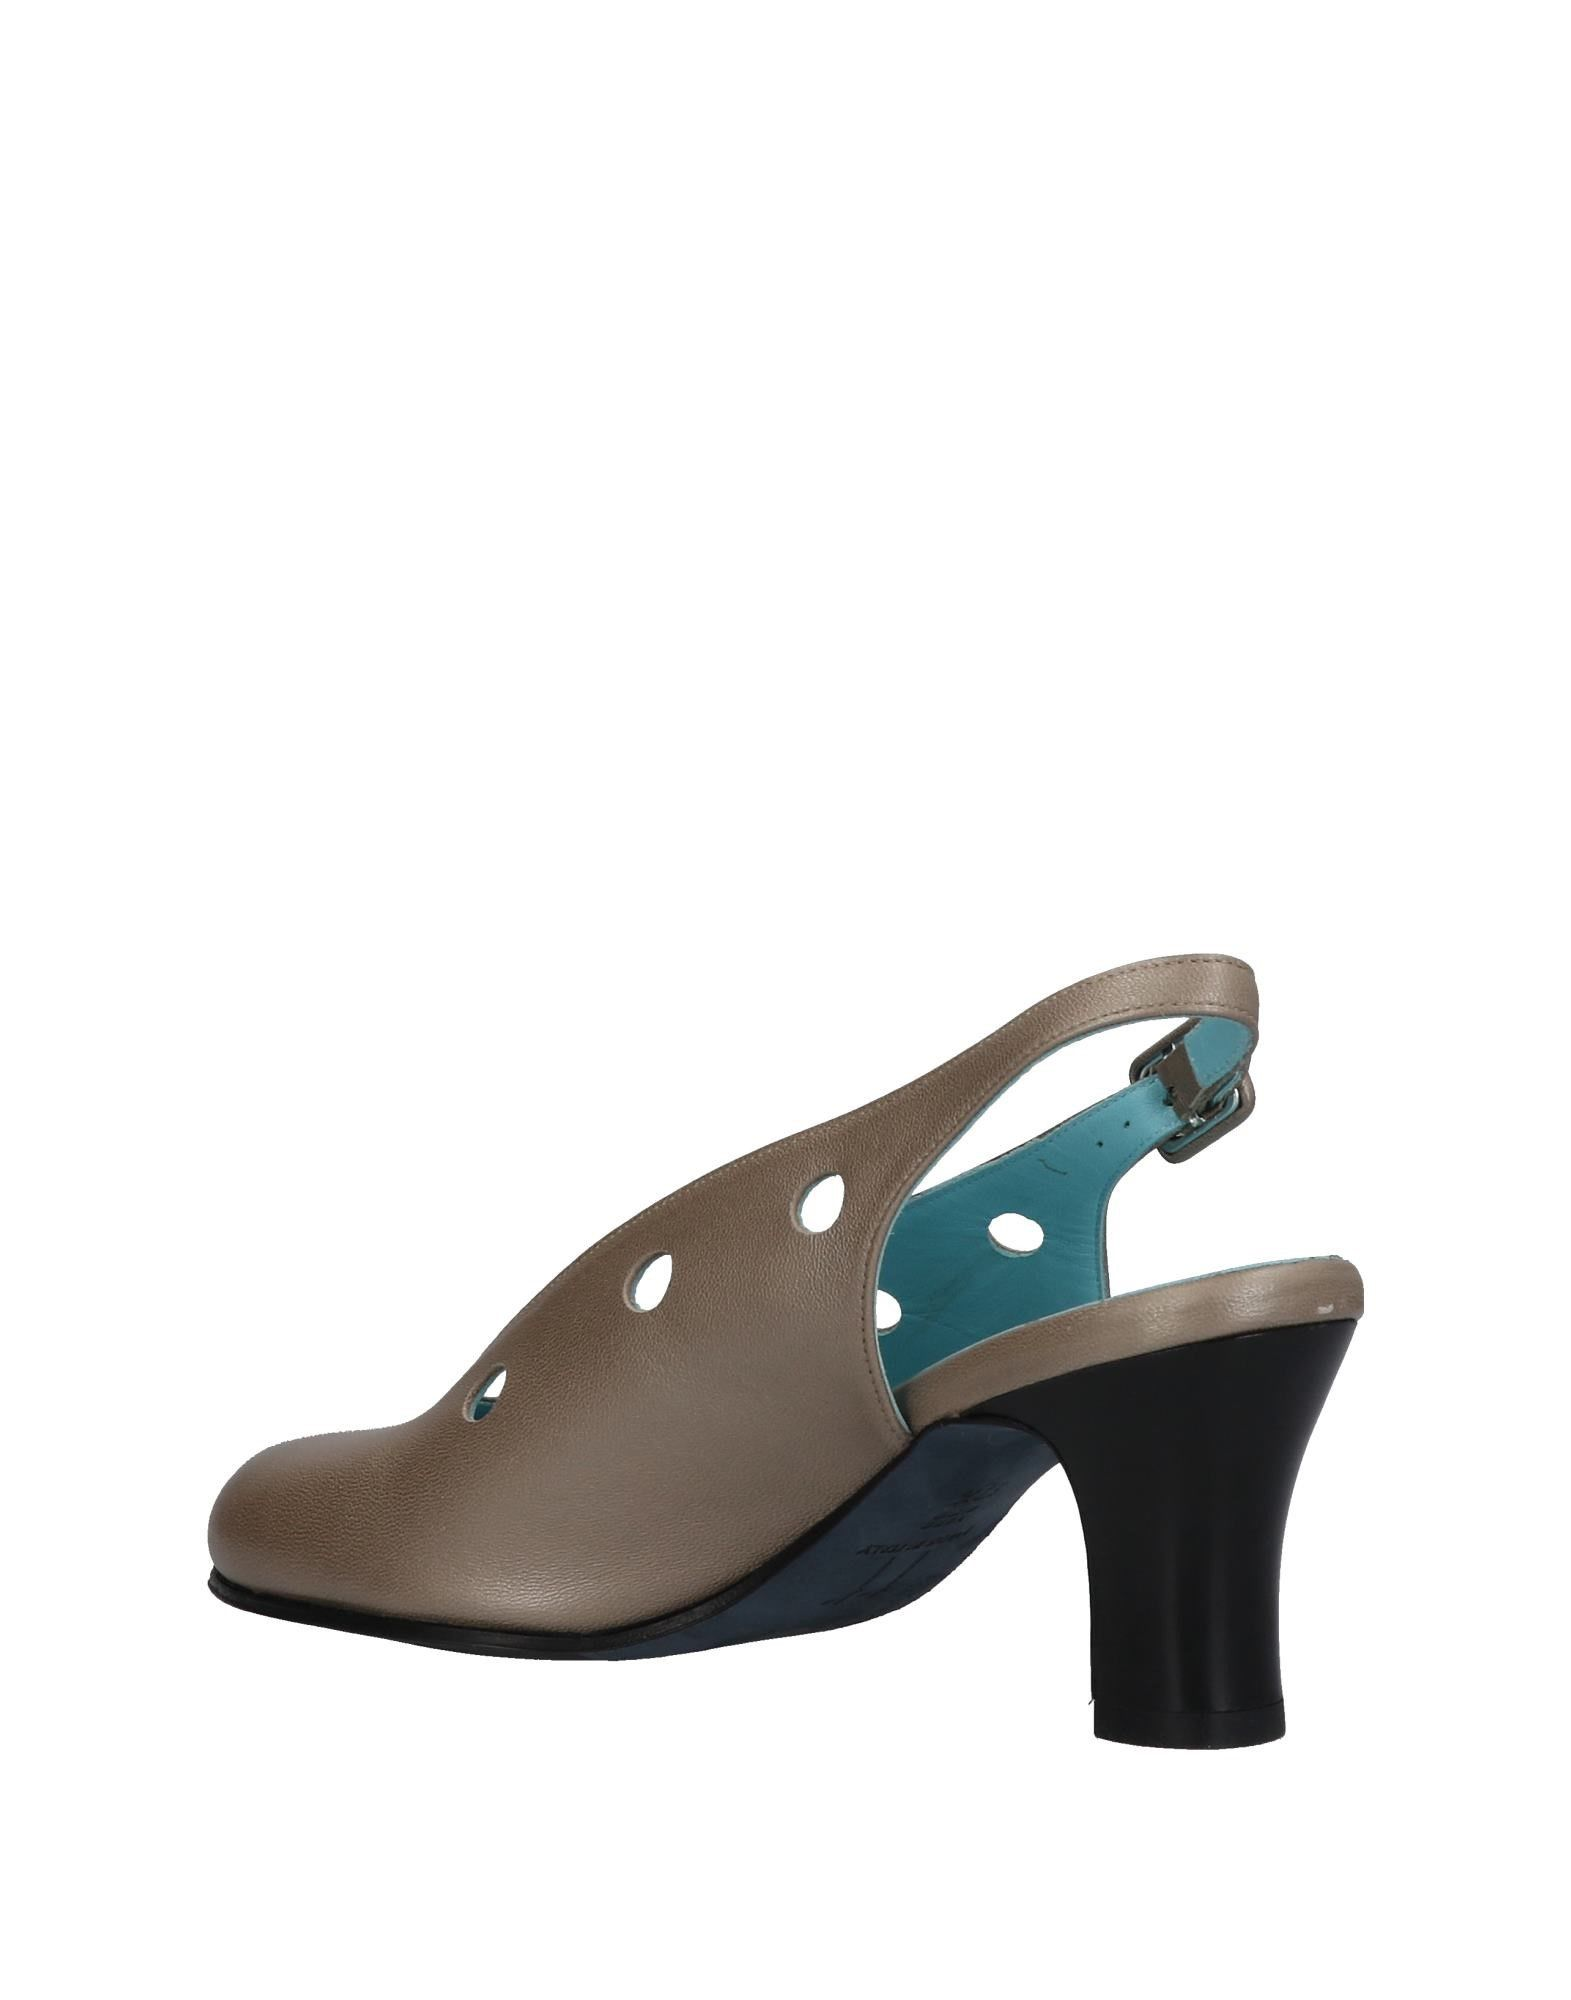 Chaussures - Tribunaux Thierry Rabotin vQiwQRfBZk